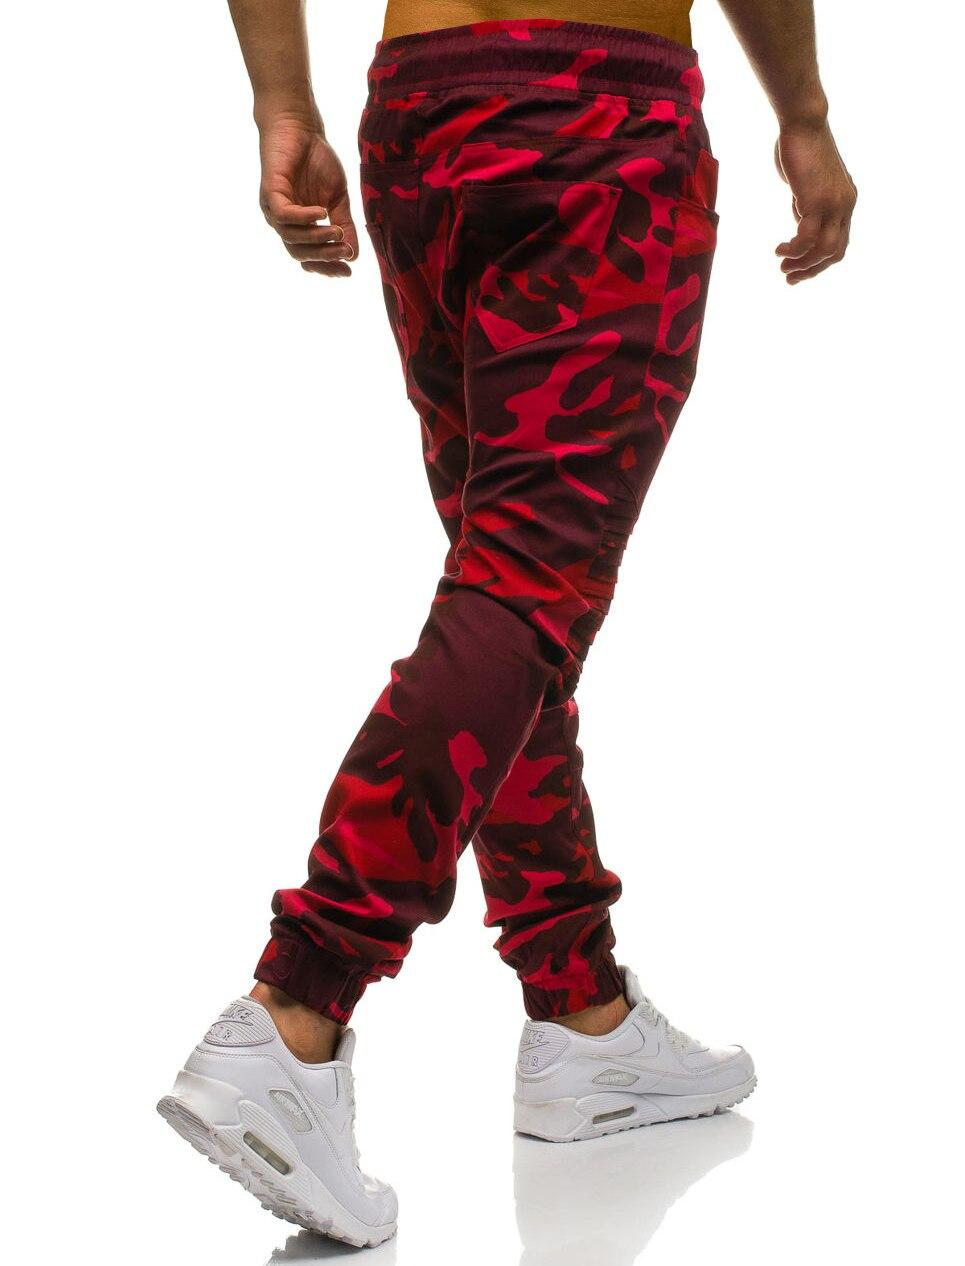 Men Sweatpants Casual Pants Slim fit Drawstring Sweatpants Slacks Elastic Waist Patchwork Pleated Ultrathin Male Trousers Jogger 20